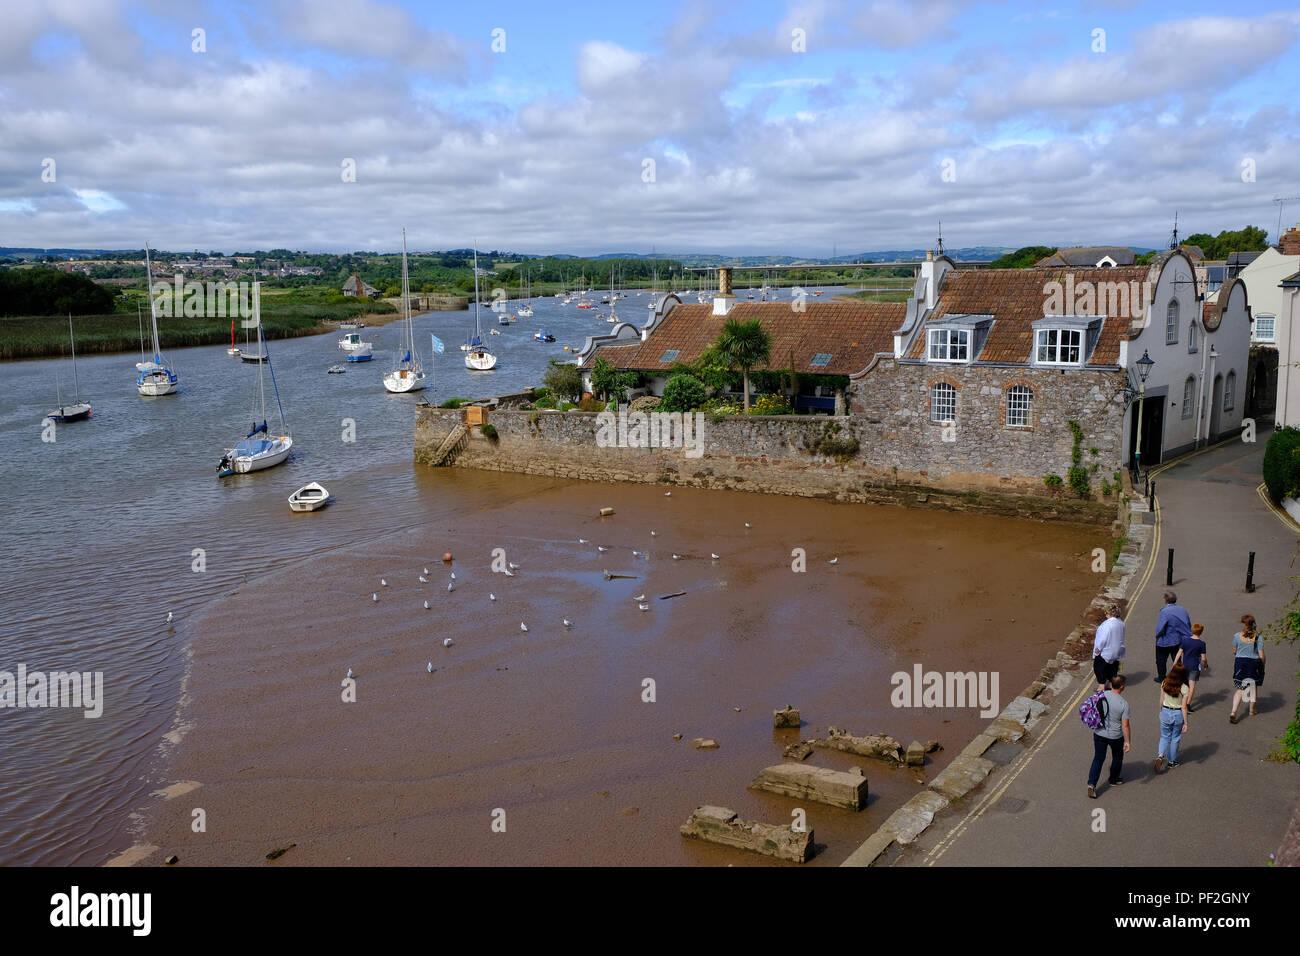 Topsham, Devon, UK. Tourists walk along the River Exe estuary in Topsham Stock Photo